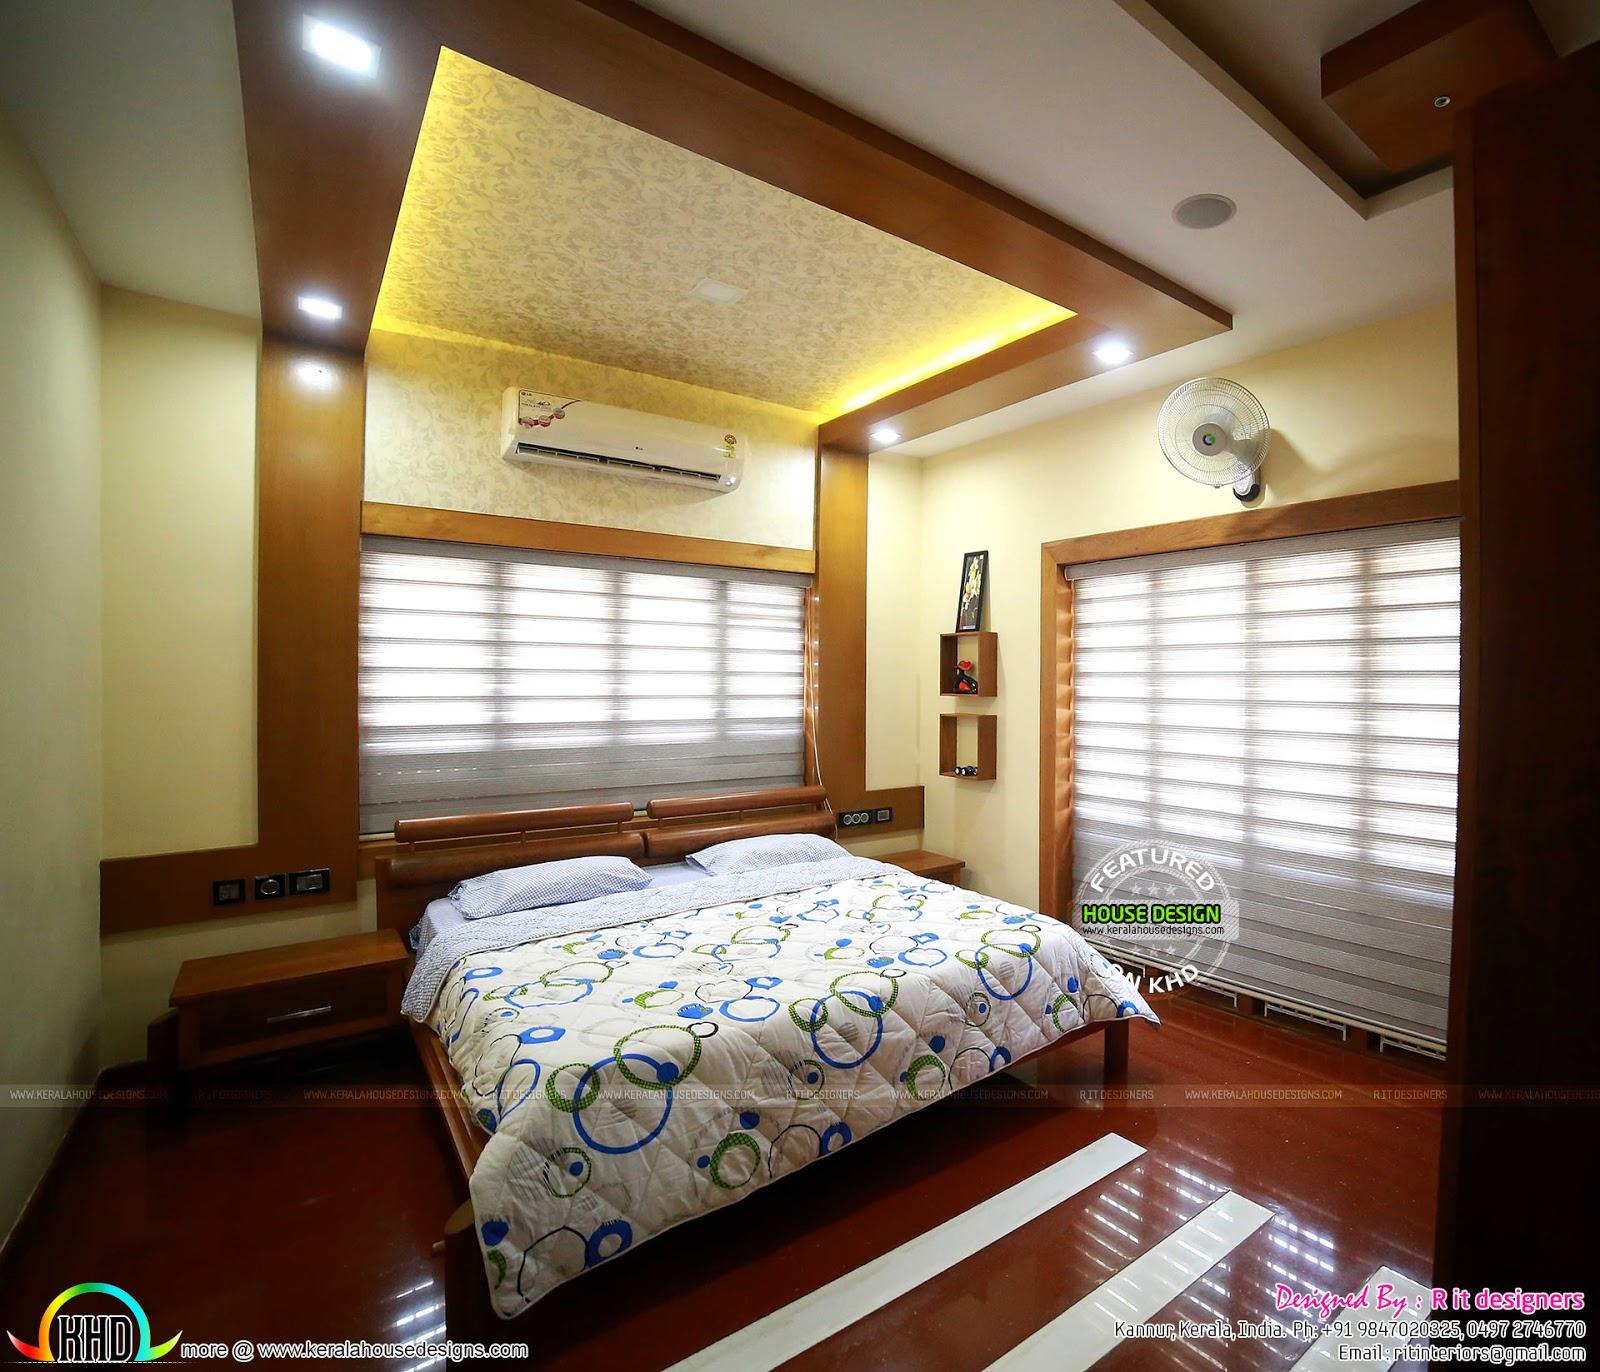 Interior Design Bedroom Kerala Style Bedroom Decor Dark Furniture Bedroom Ideas Rectangular Rooms Boys Bedroom Colour Ideas: Finished Home, Floor Plan And Interiors